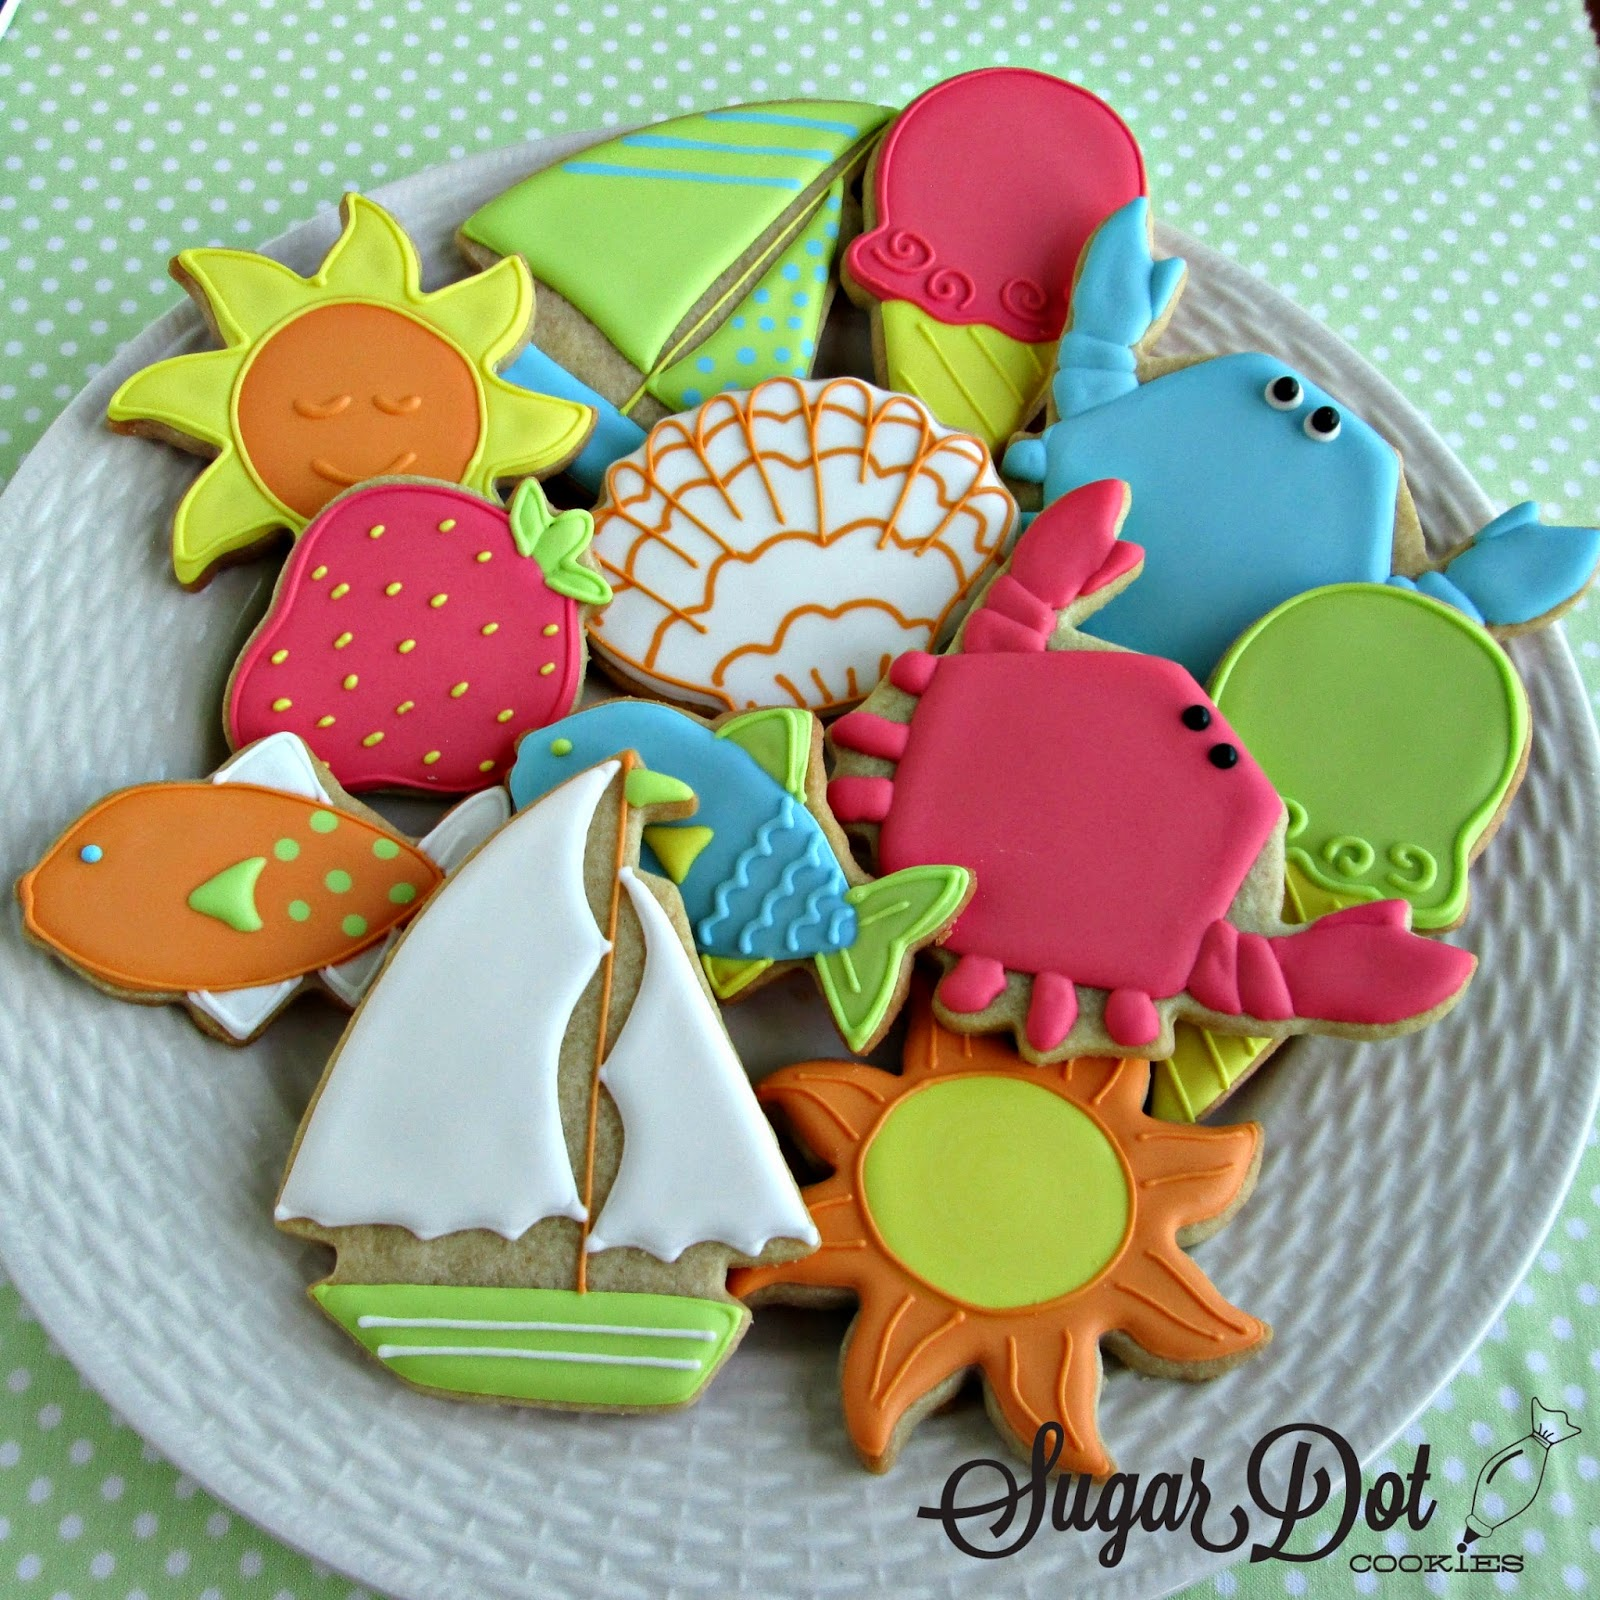 Royal Icing Cake Decorating Ideas